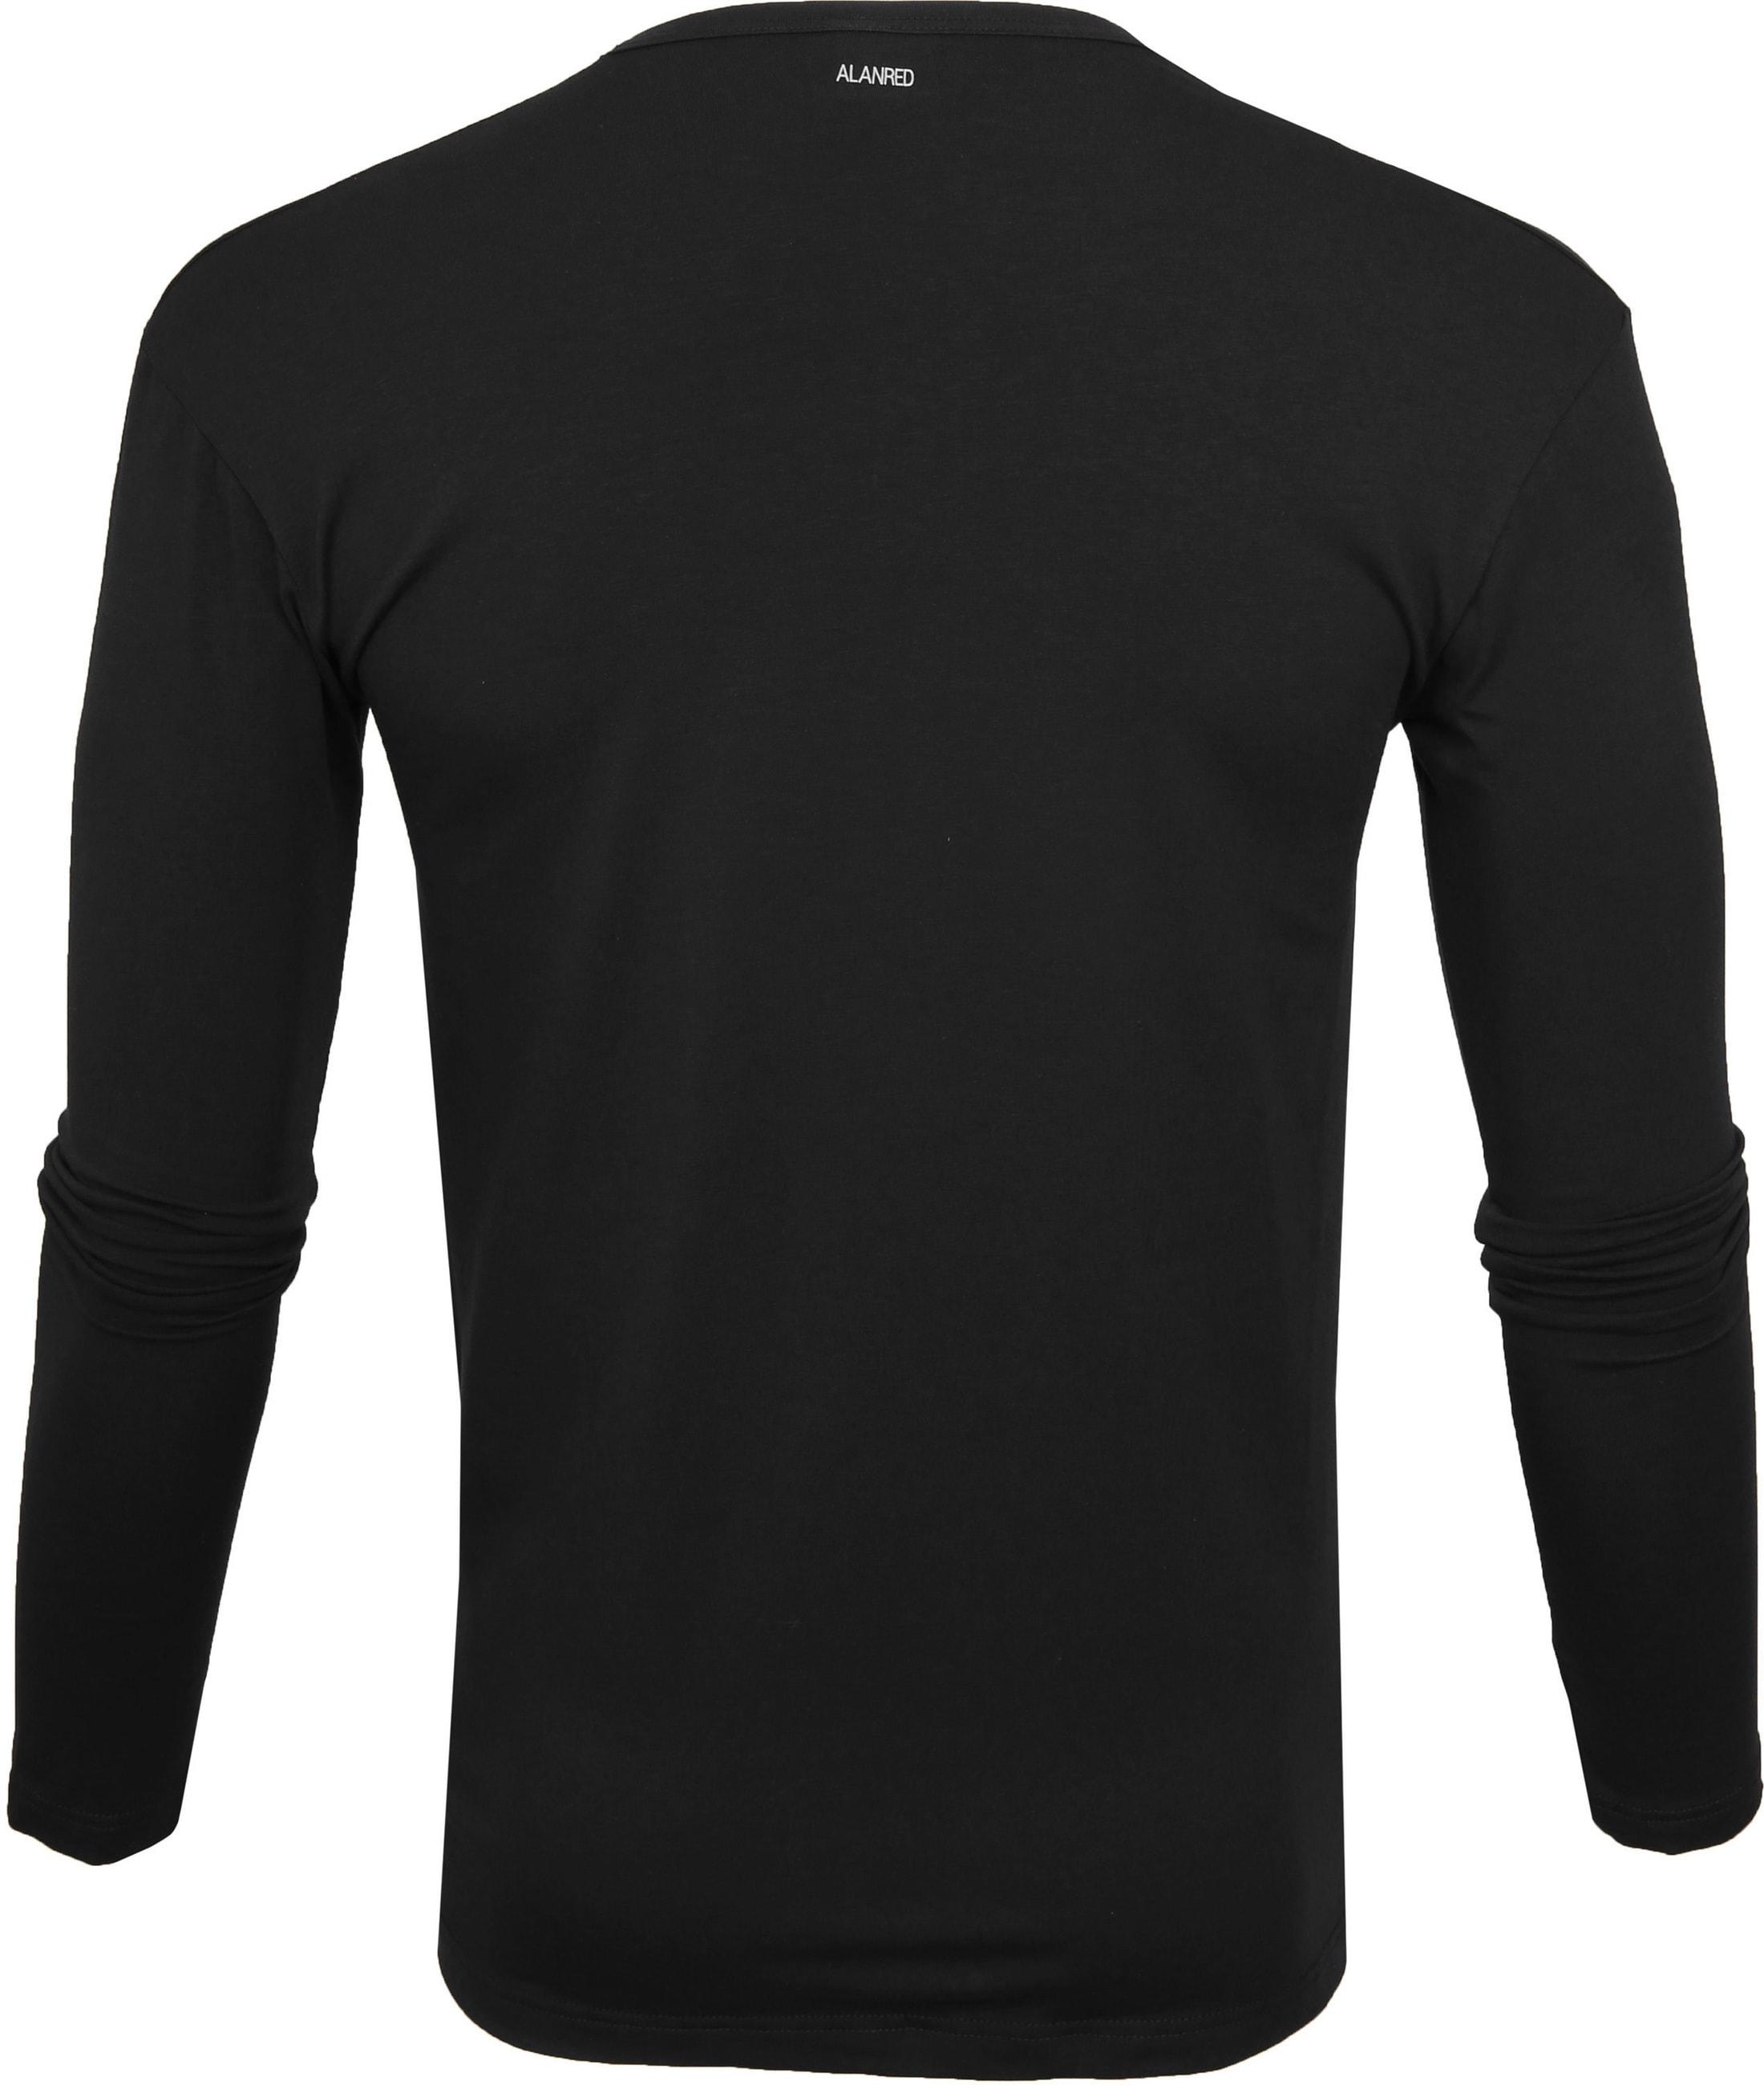 Alan Red Olbia Longsleeve T-shirt Black foto 2